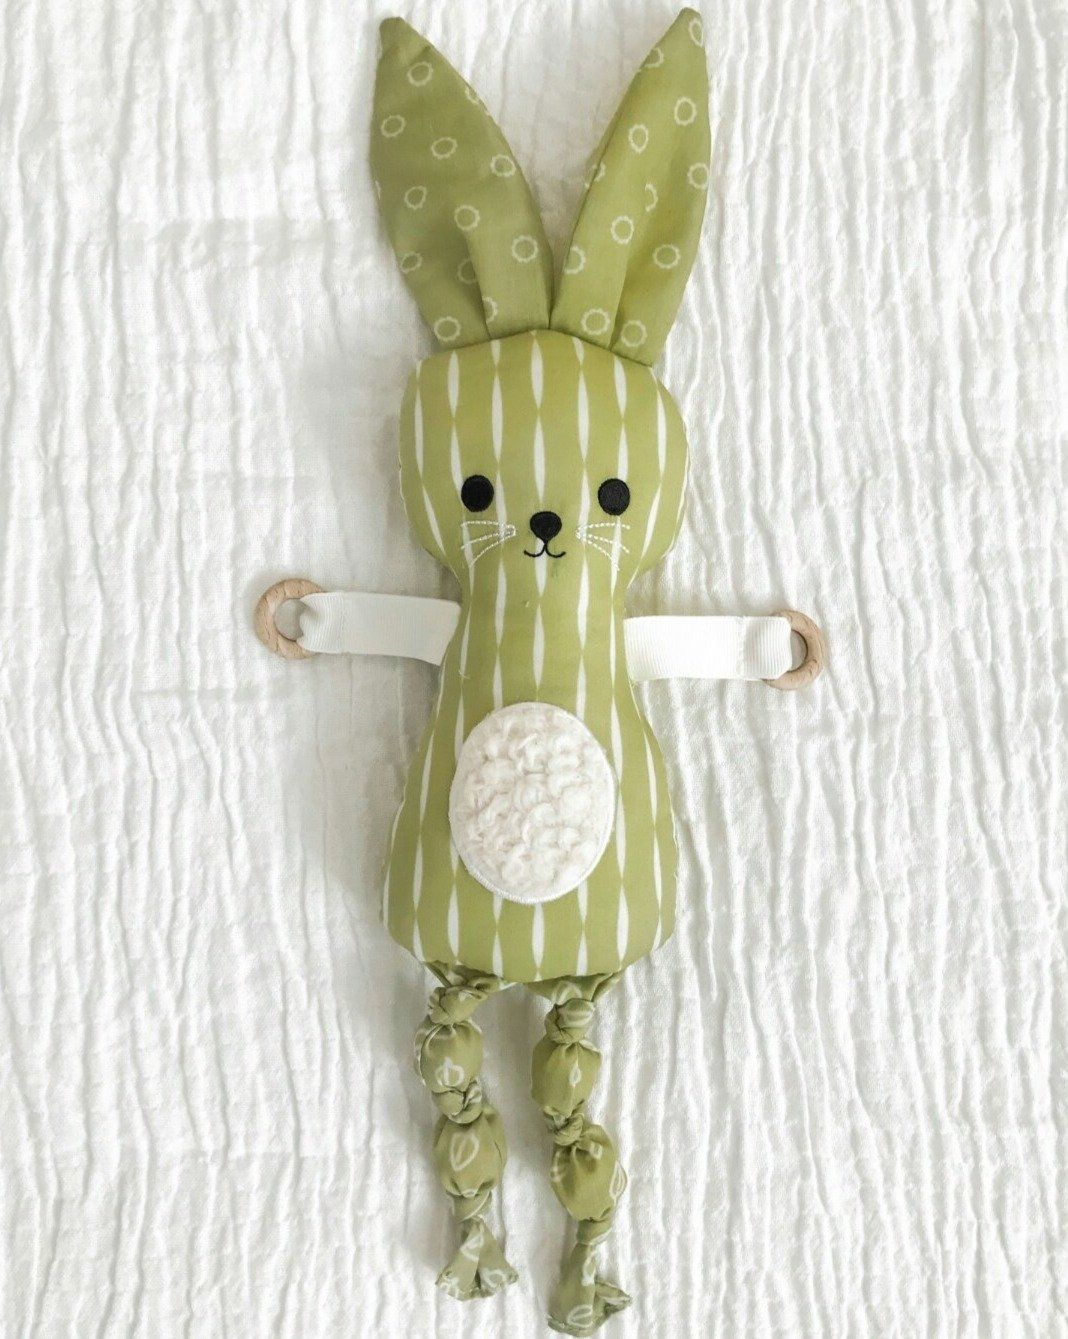 Baby shower gift cuddly toy Panda soft toy furry toy wet felted custom stuffed animal handmade fluffy toy